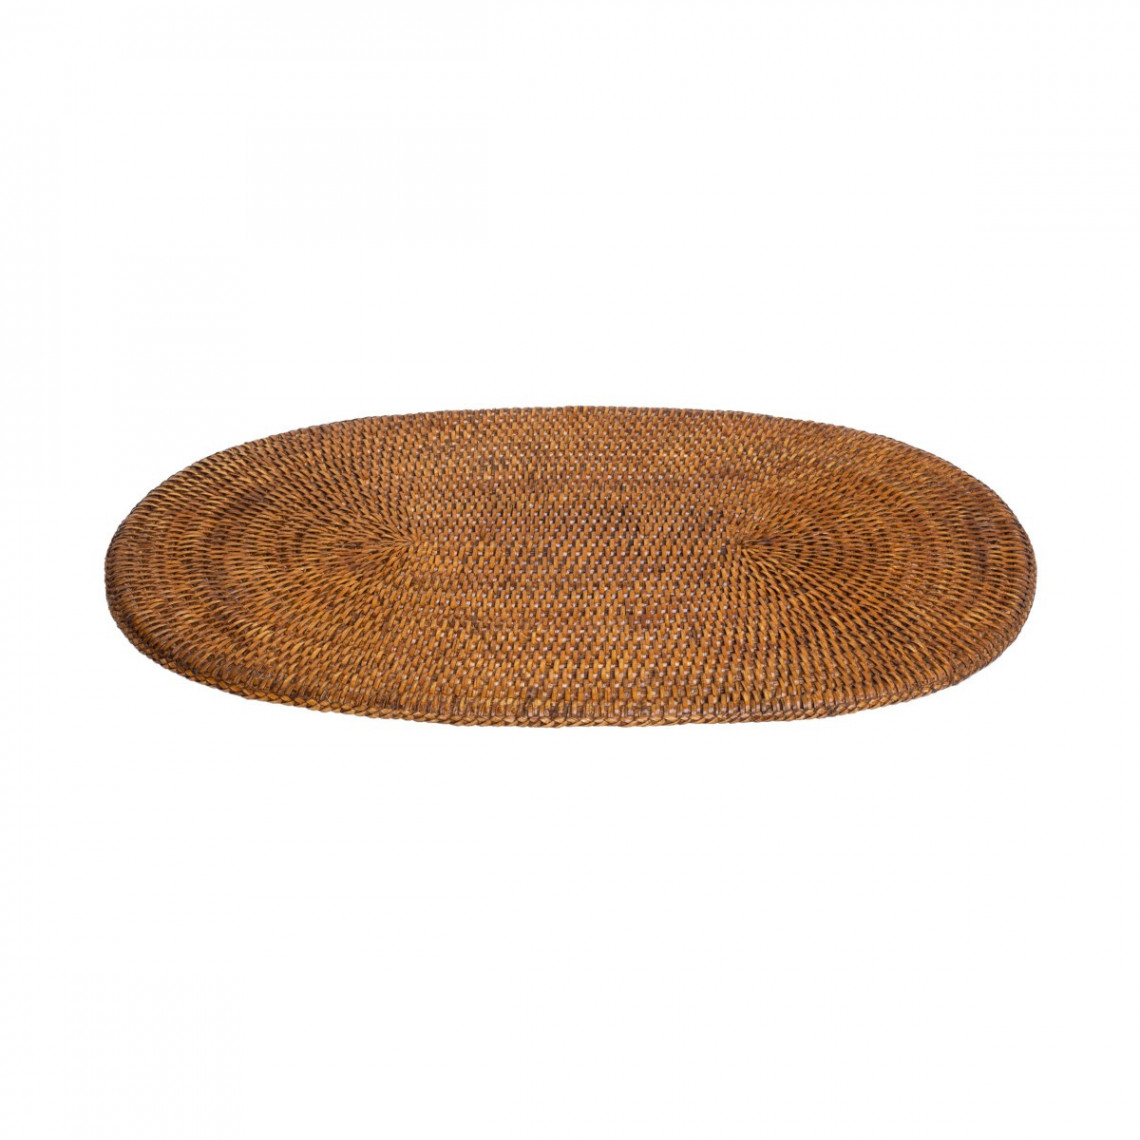 Set de table ovale en rotin Safari (31 x 46 cm)